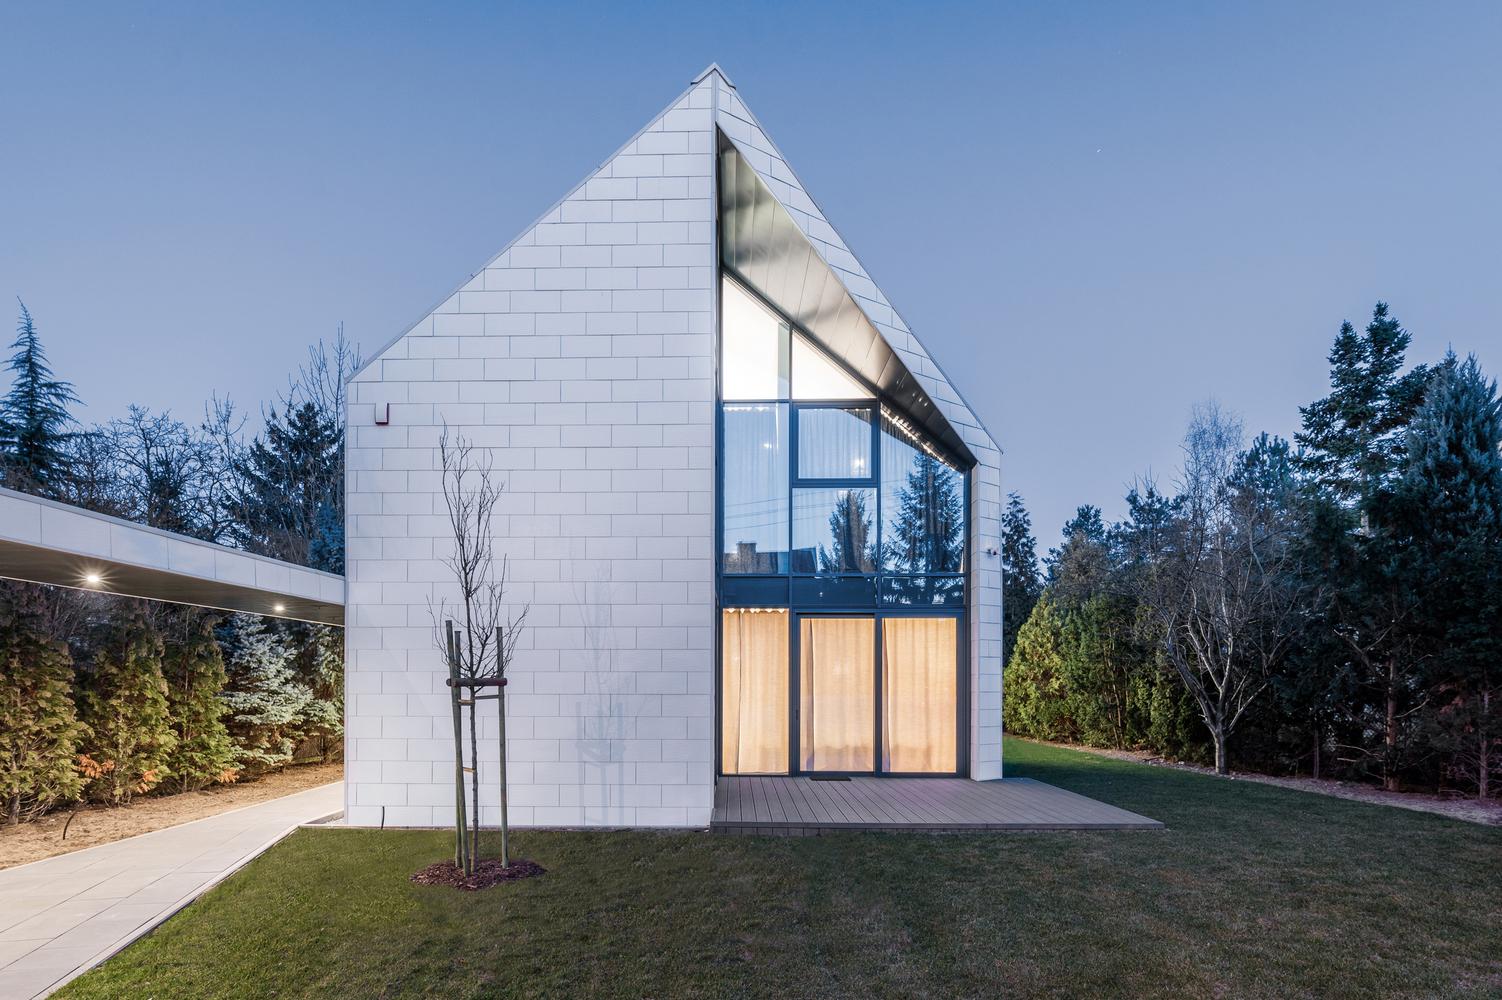 The Cutting-Edge House / PAG Pracownia Architektury Glowacki